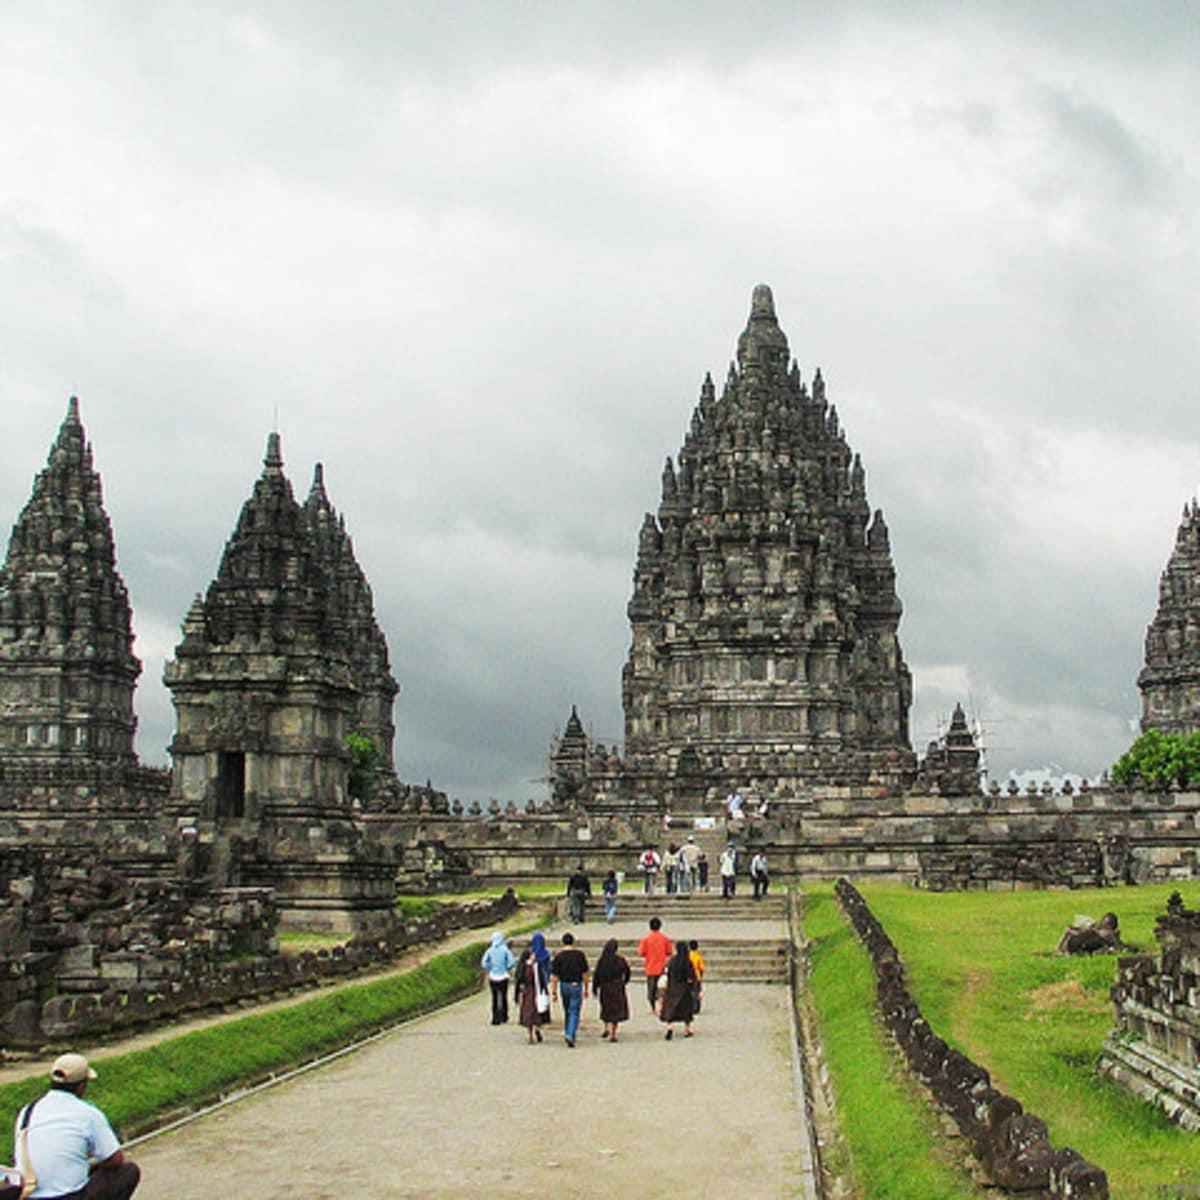 Yogyas Kultur und Erbe Tagestour - Tagesausflug in Yogyakarta